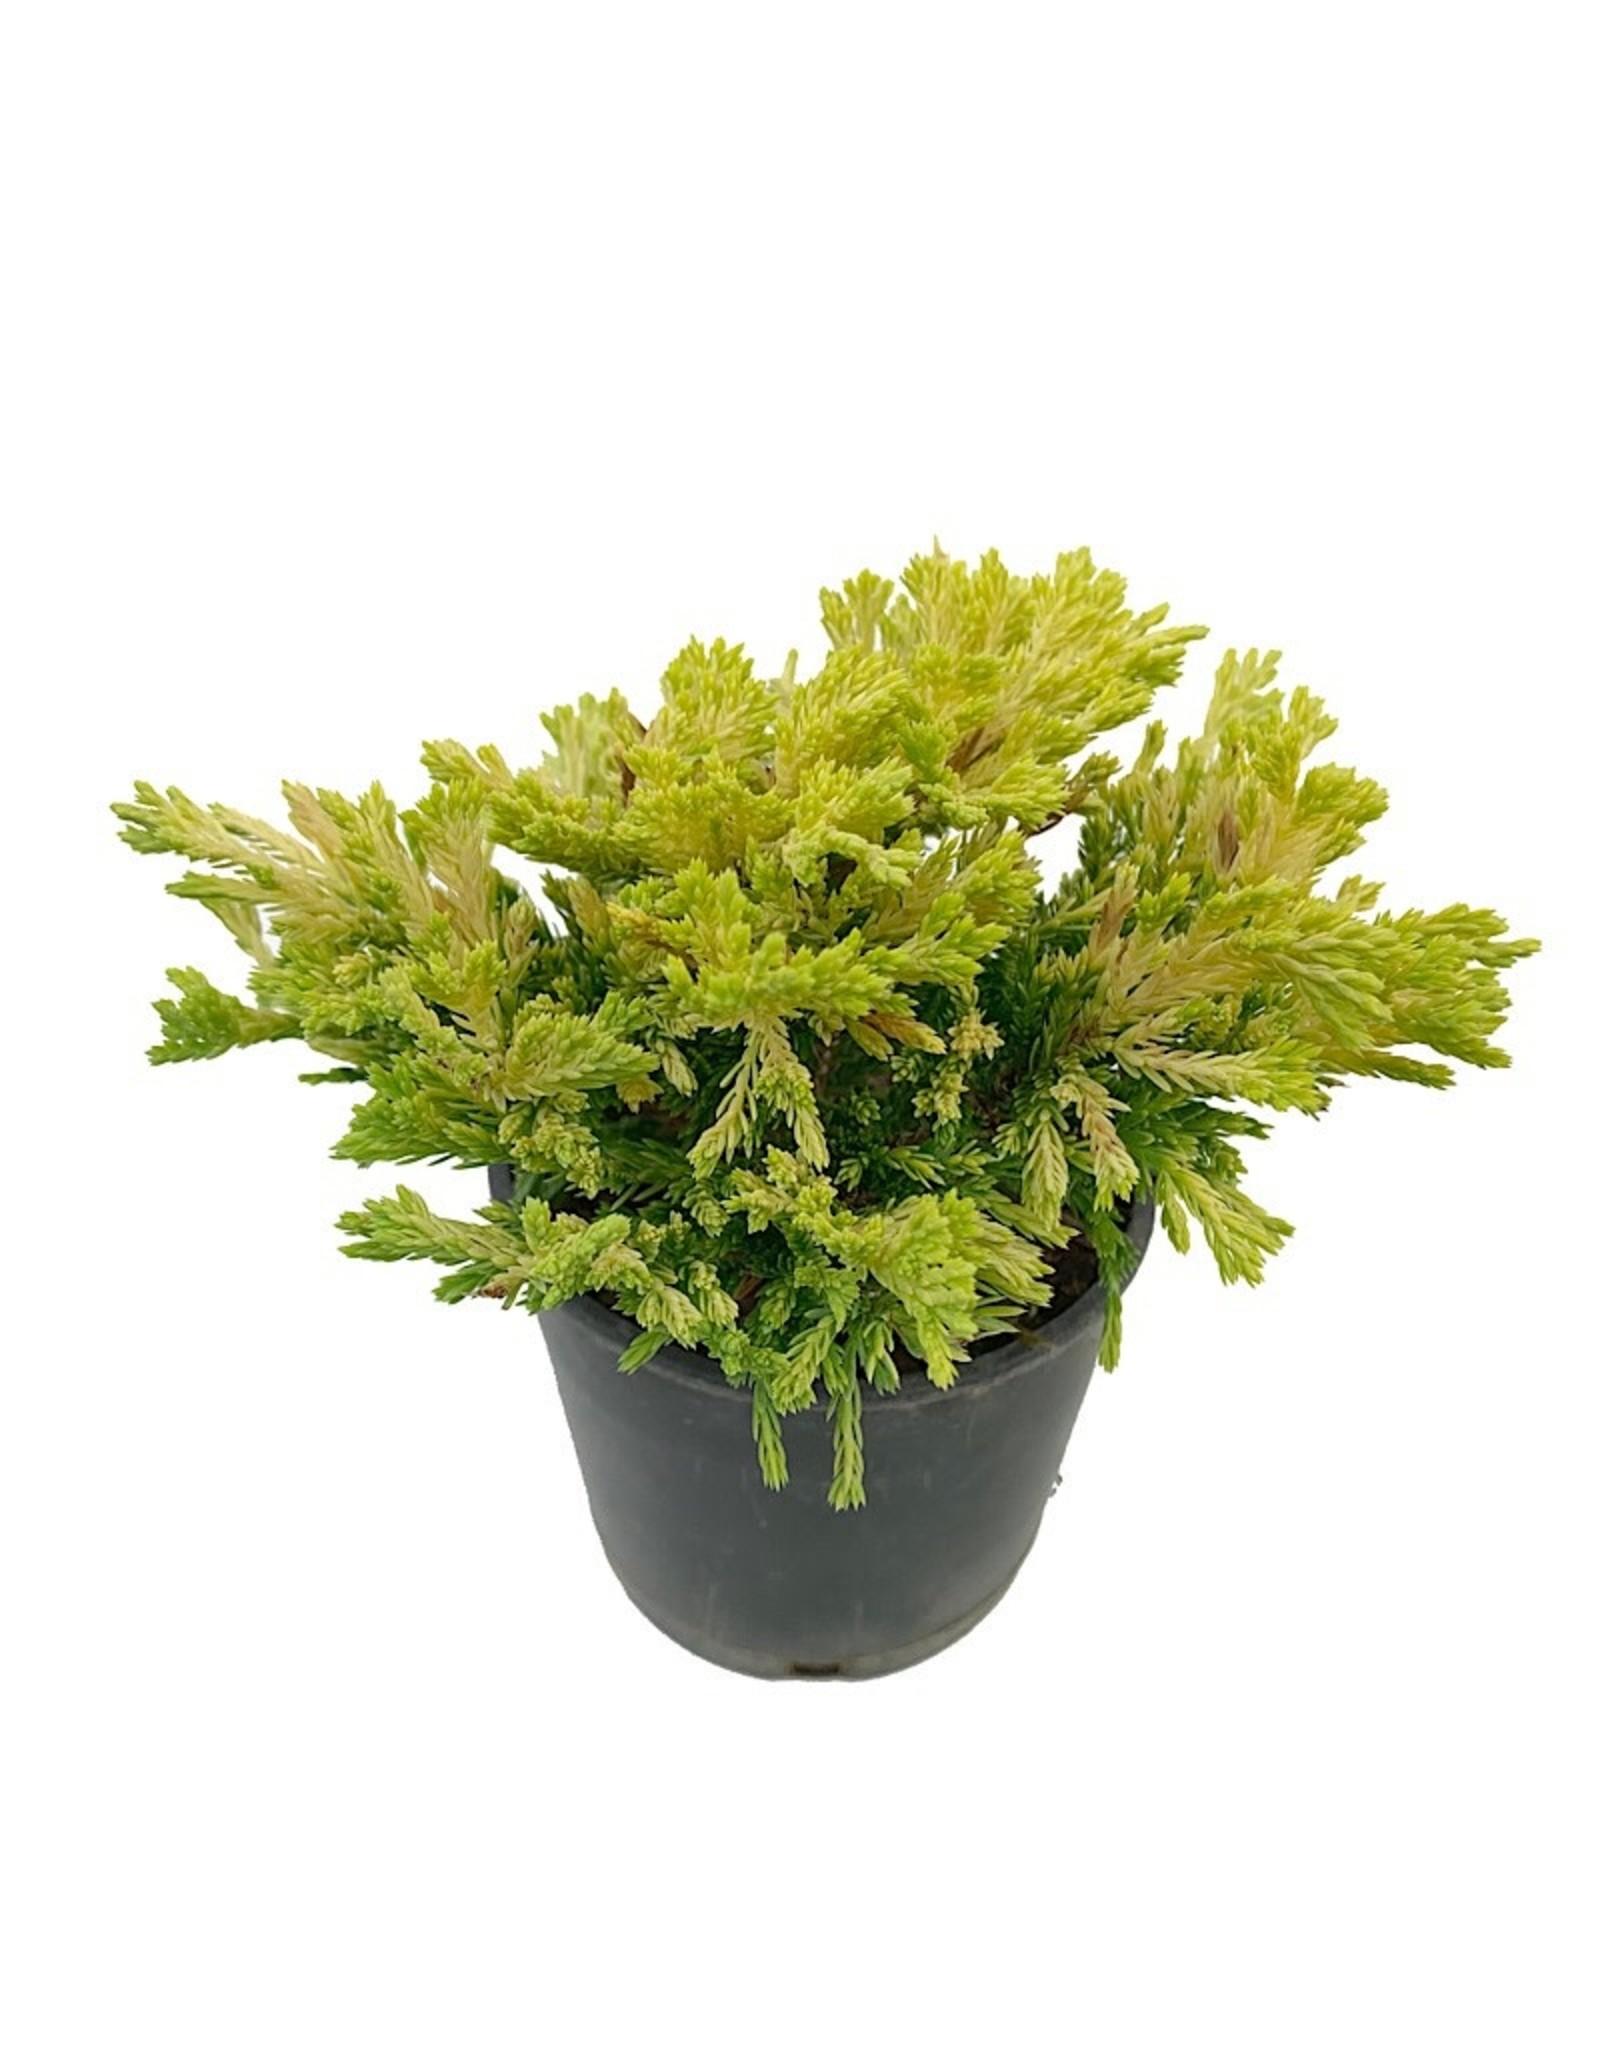 Juniperus horizontalis 'Gold Strike' - 4 inch